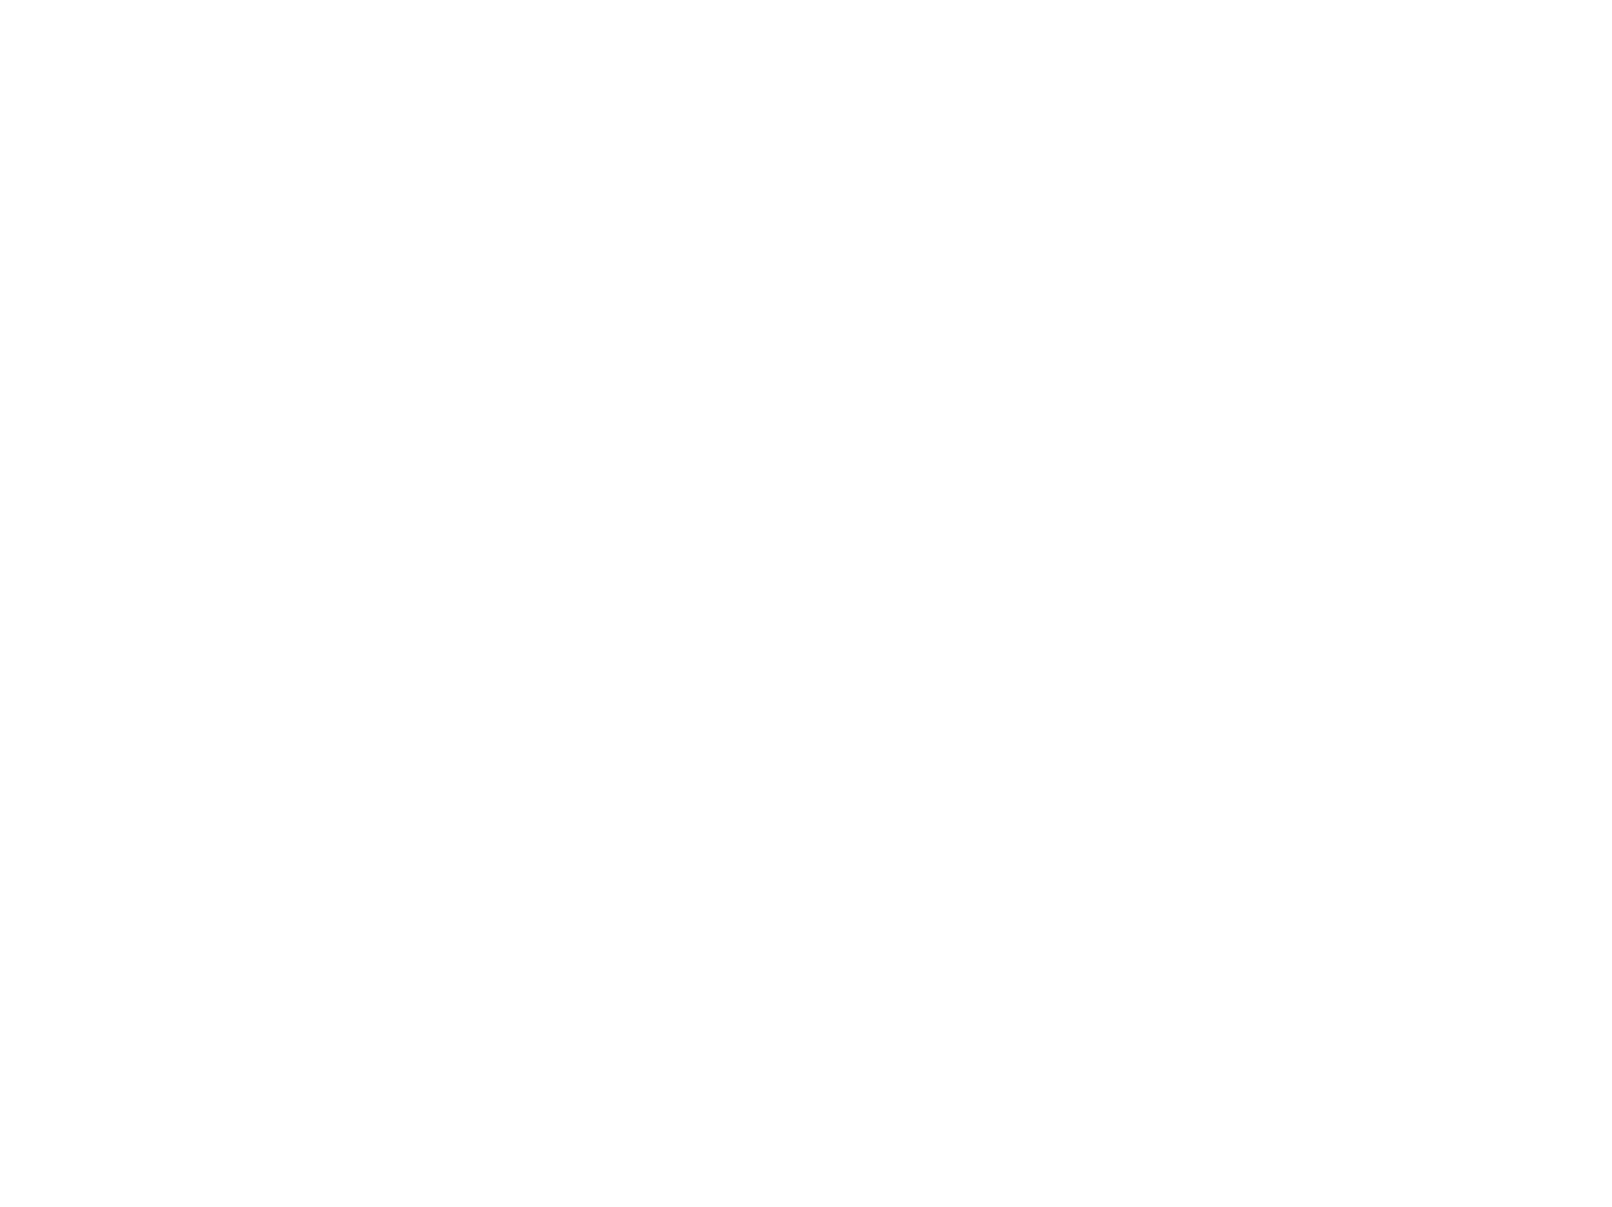 kwtravel_white.png